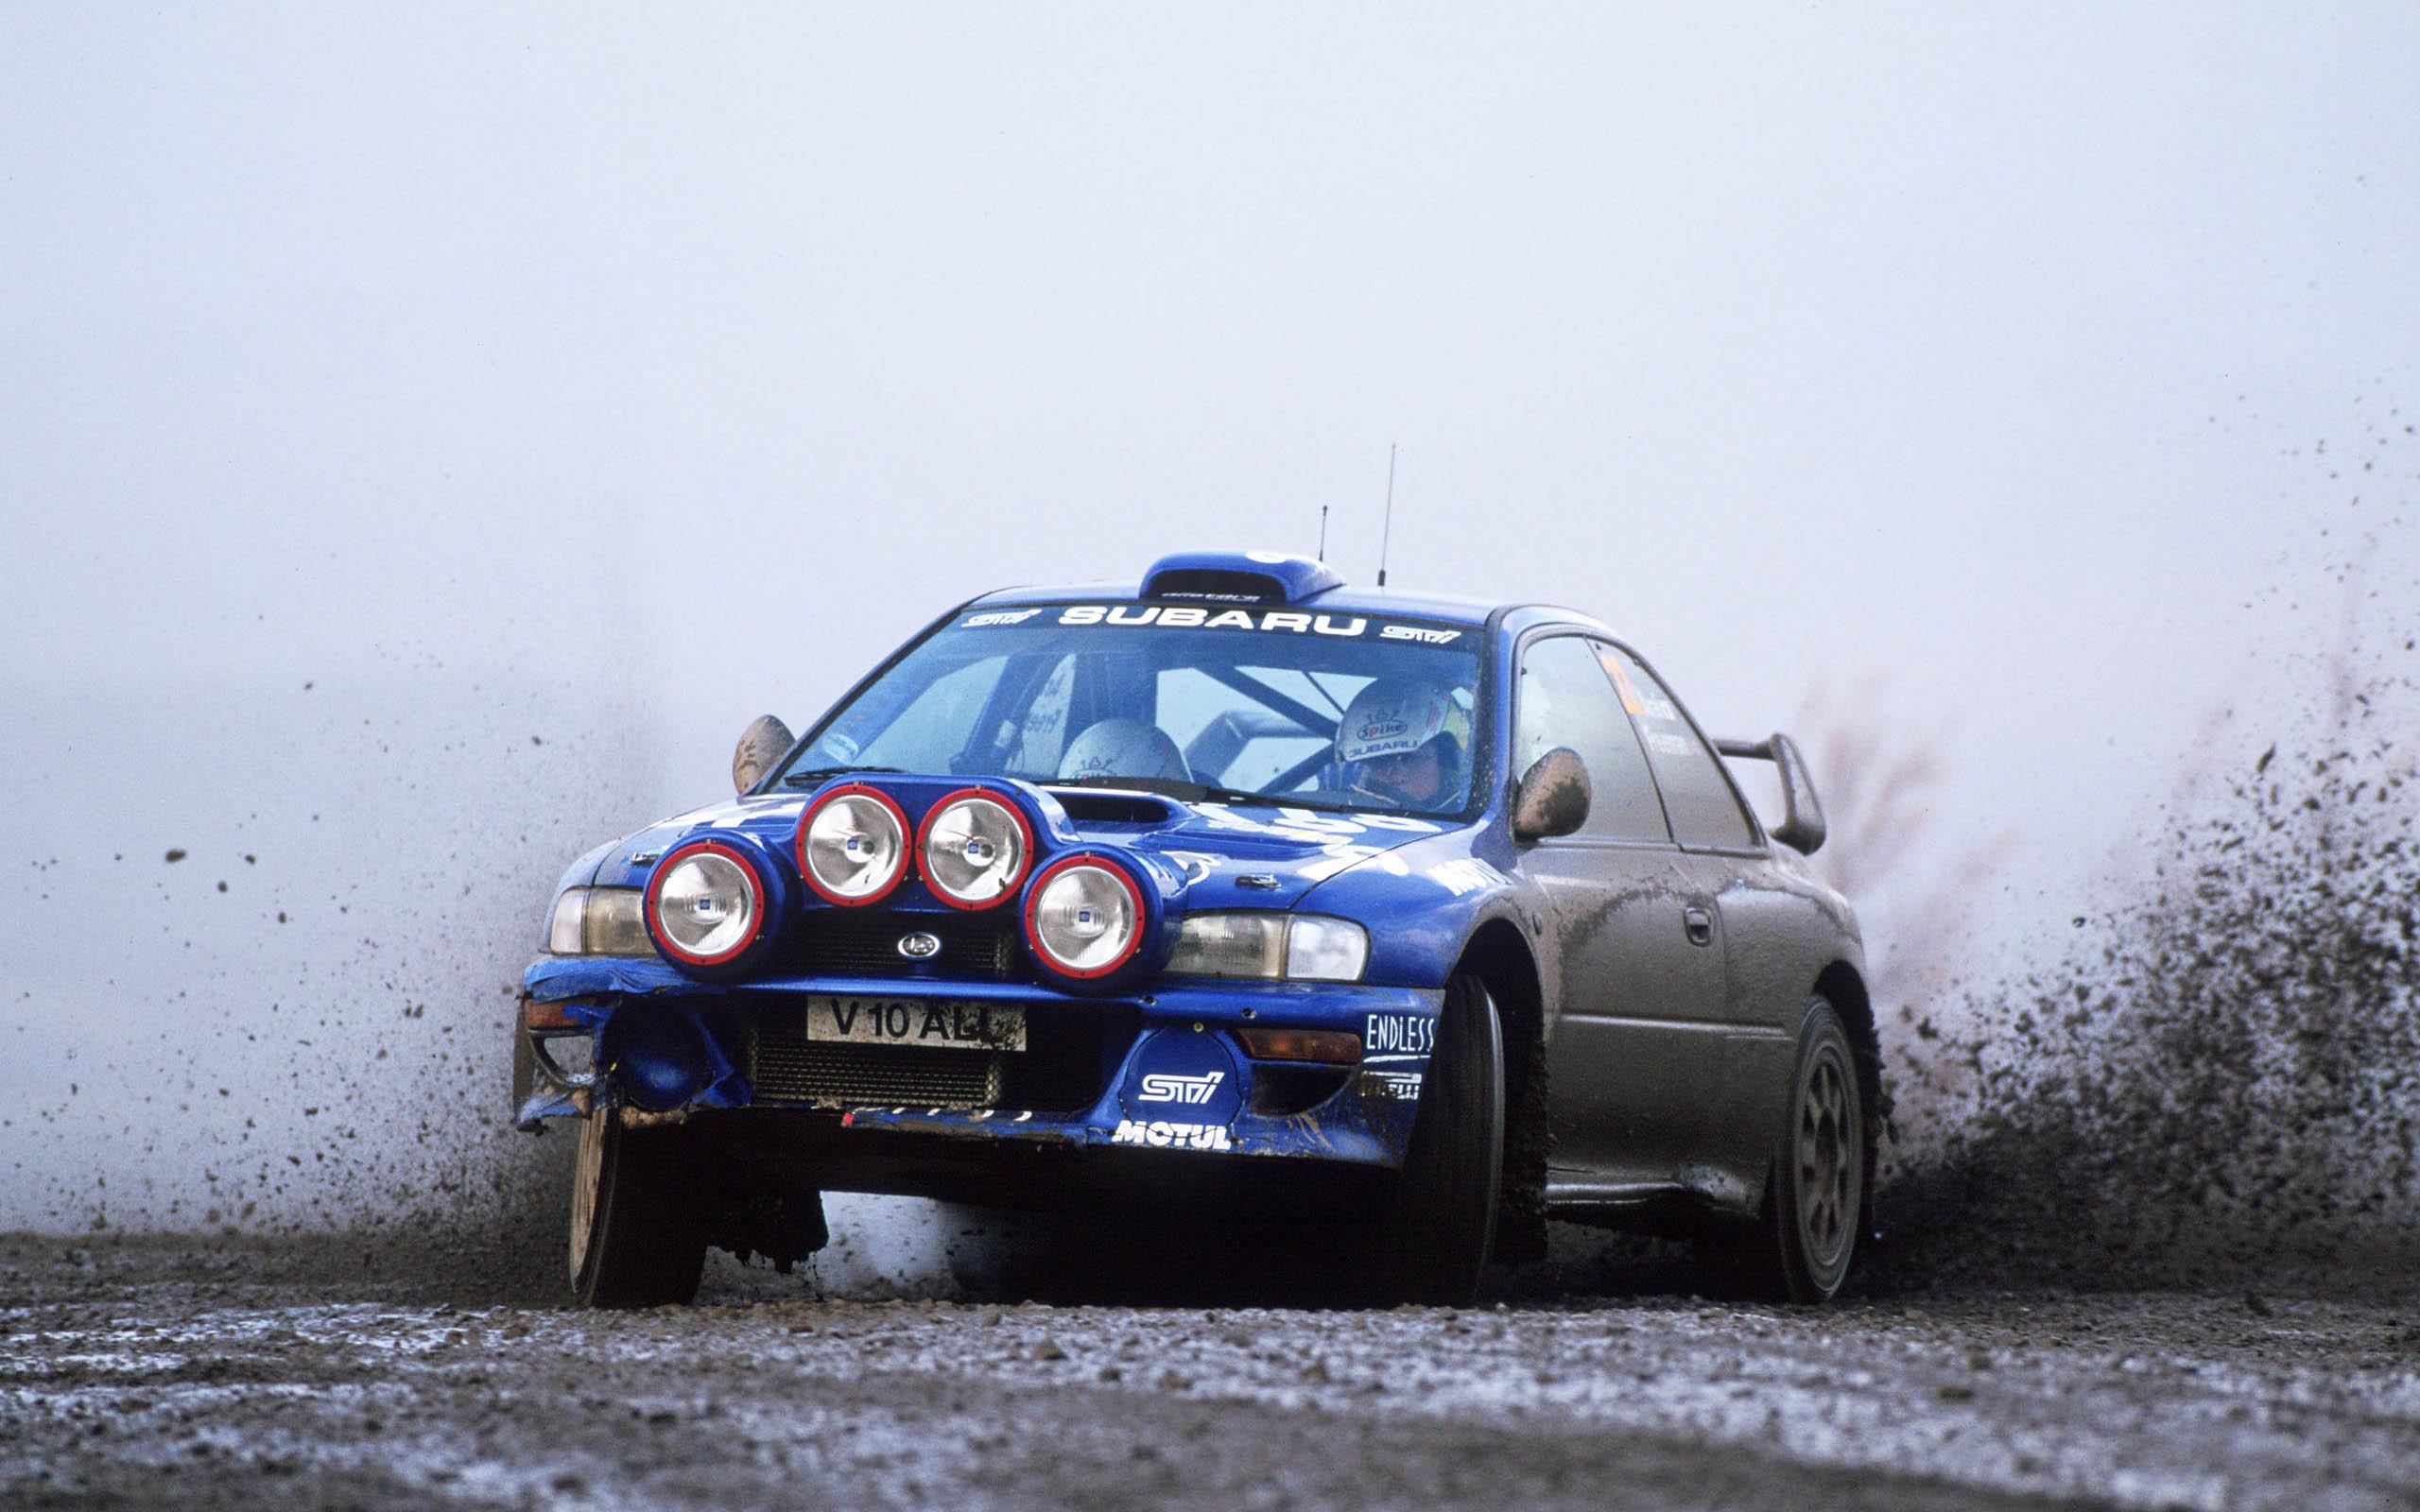 Cars Subaru Impreza WRX STI rally car wallpaper | | 60593 |  WallpaperUP